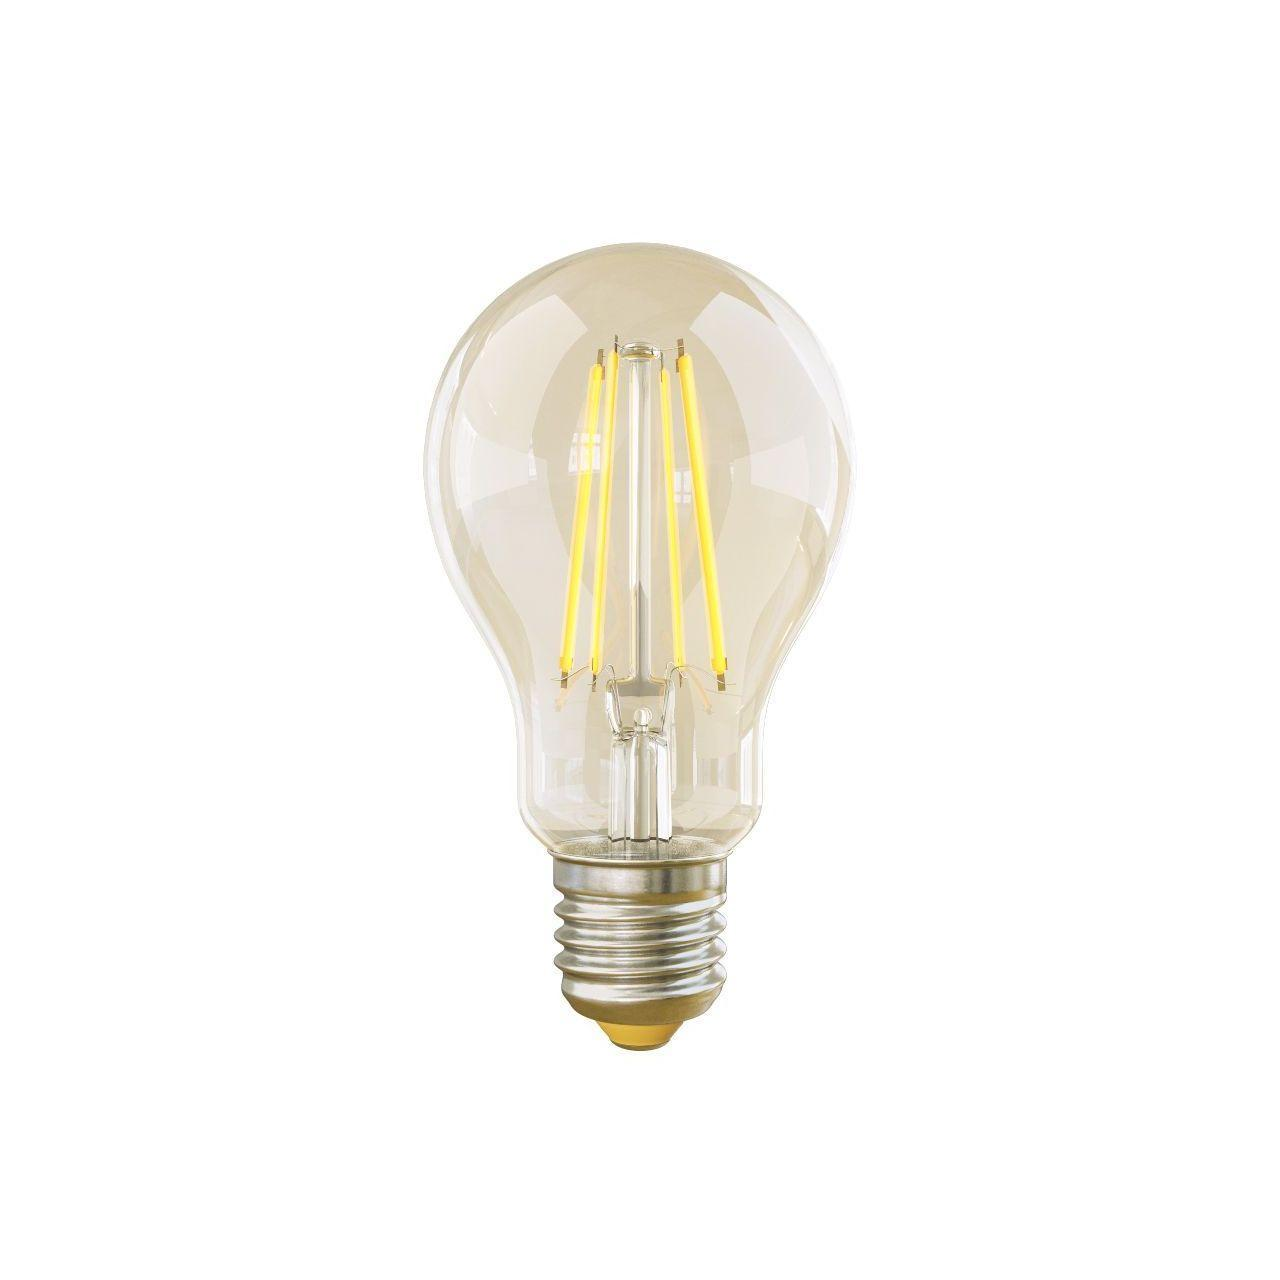 Лампа светодиодная филаментная диммируемая E27 8W 2800К прозрачная VG10-А1E27warm8W-FD 5489 voltega лампа светодиодная диммируемая voltega груша прозрачная e27 8w 4000k vg10 а1e27cold8w fd 5489